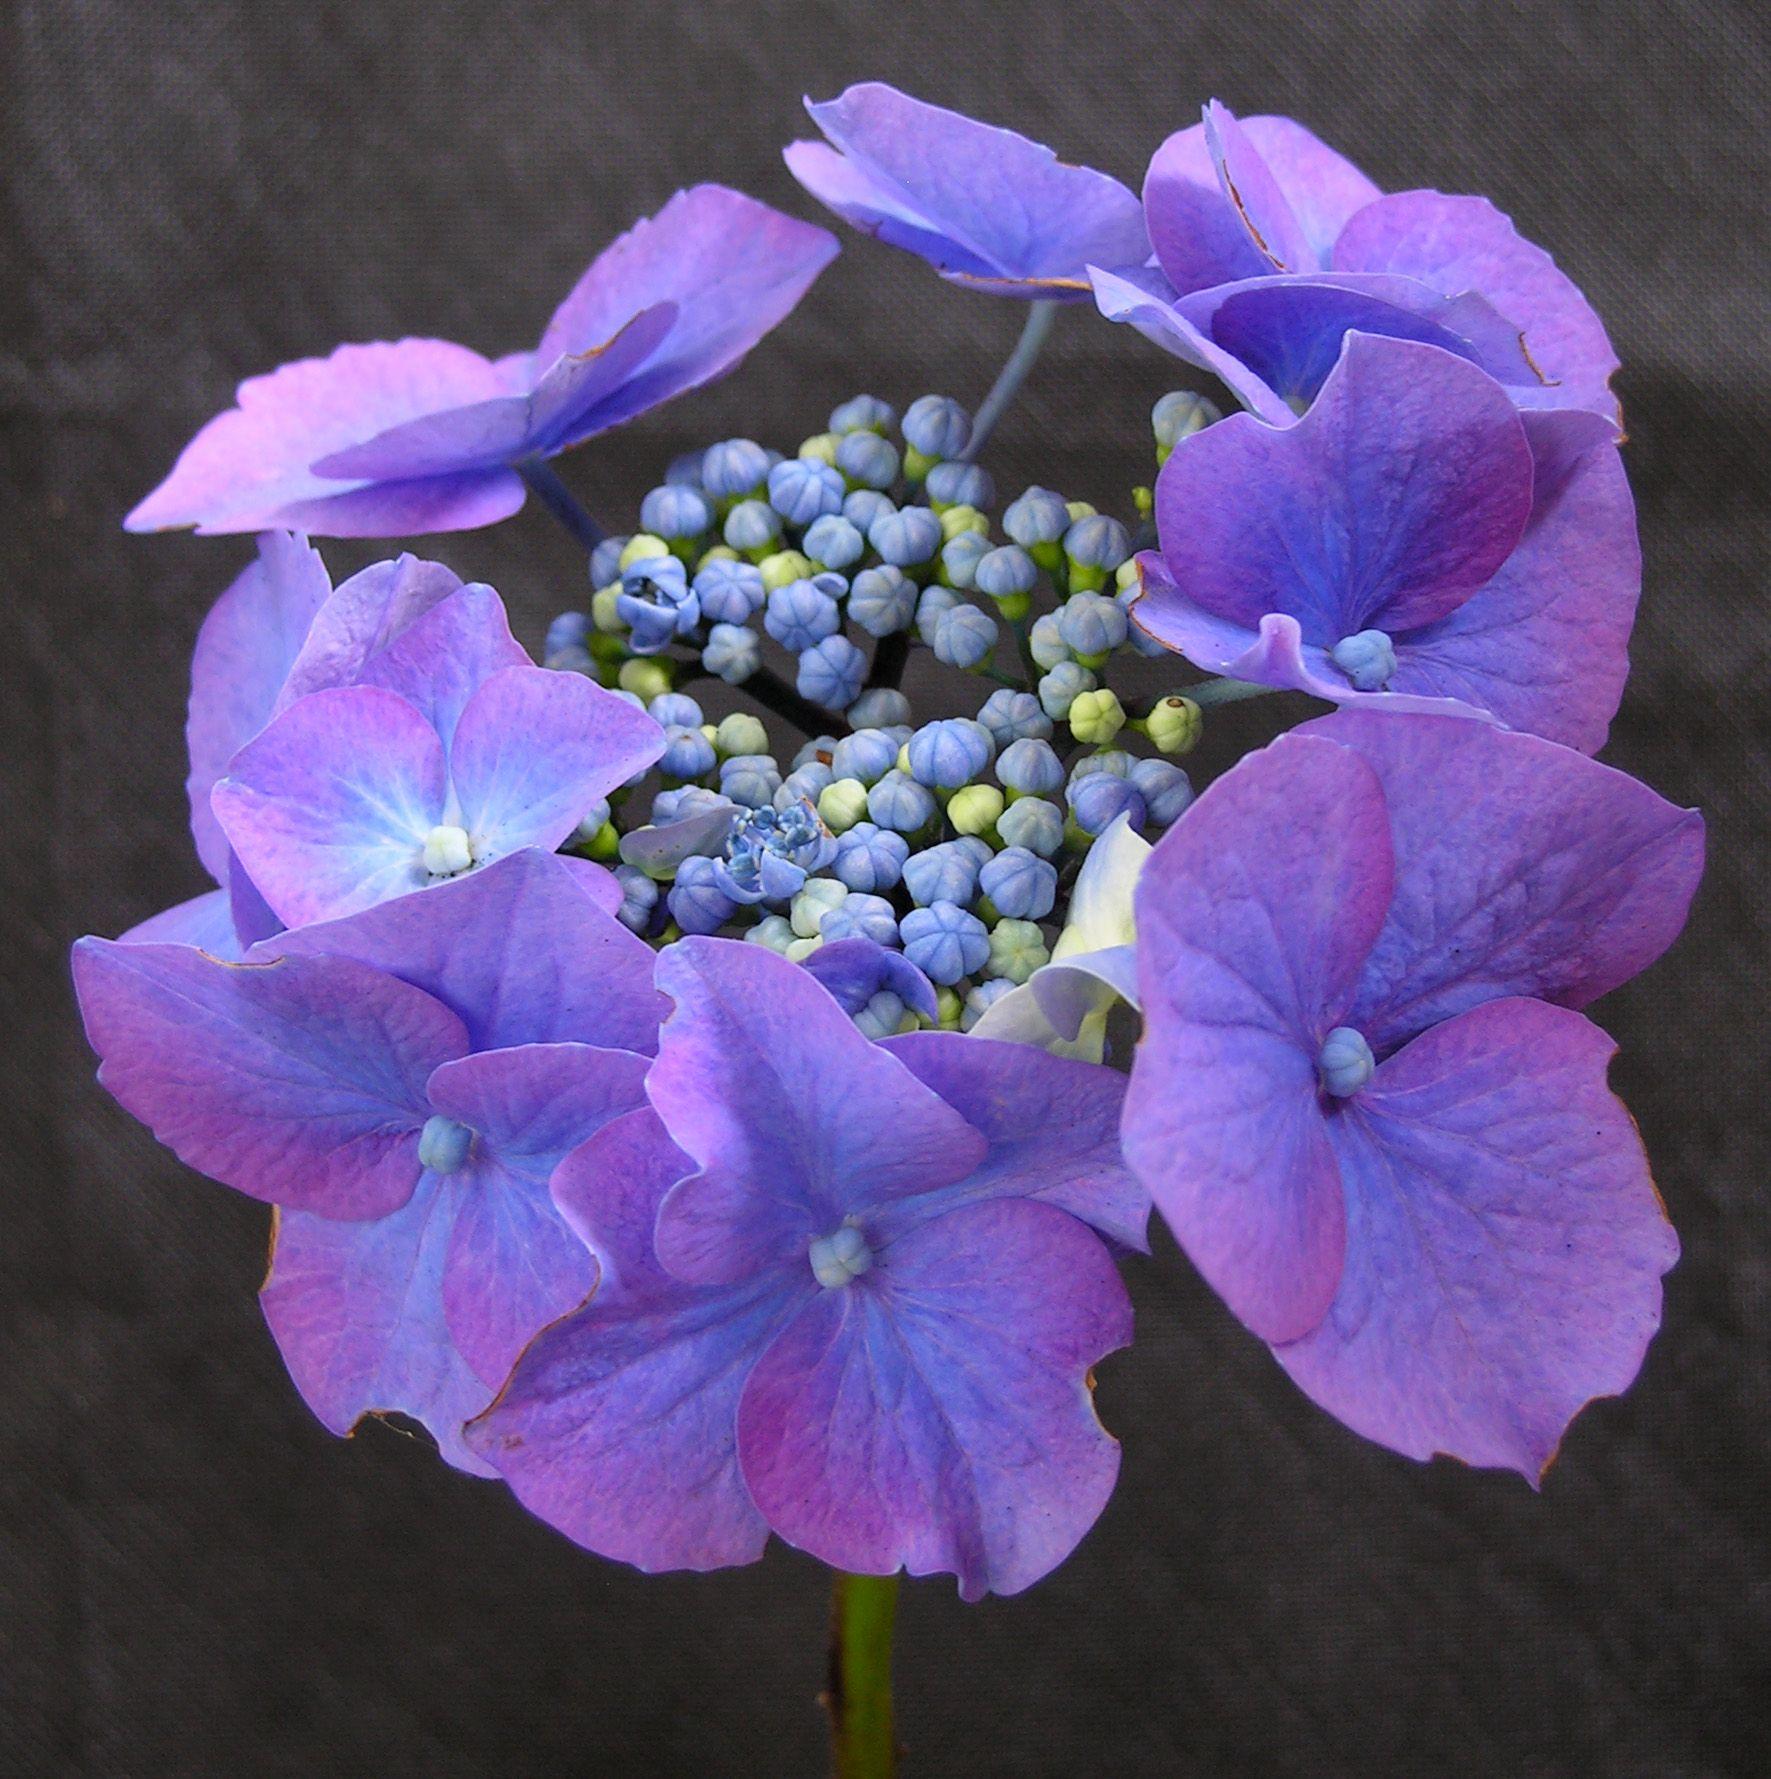 Hydrangea macrophylla 'Blaumeise', synonyms 'Teller Blue